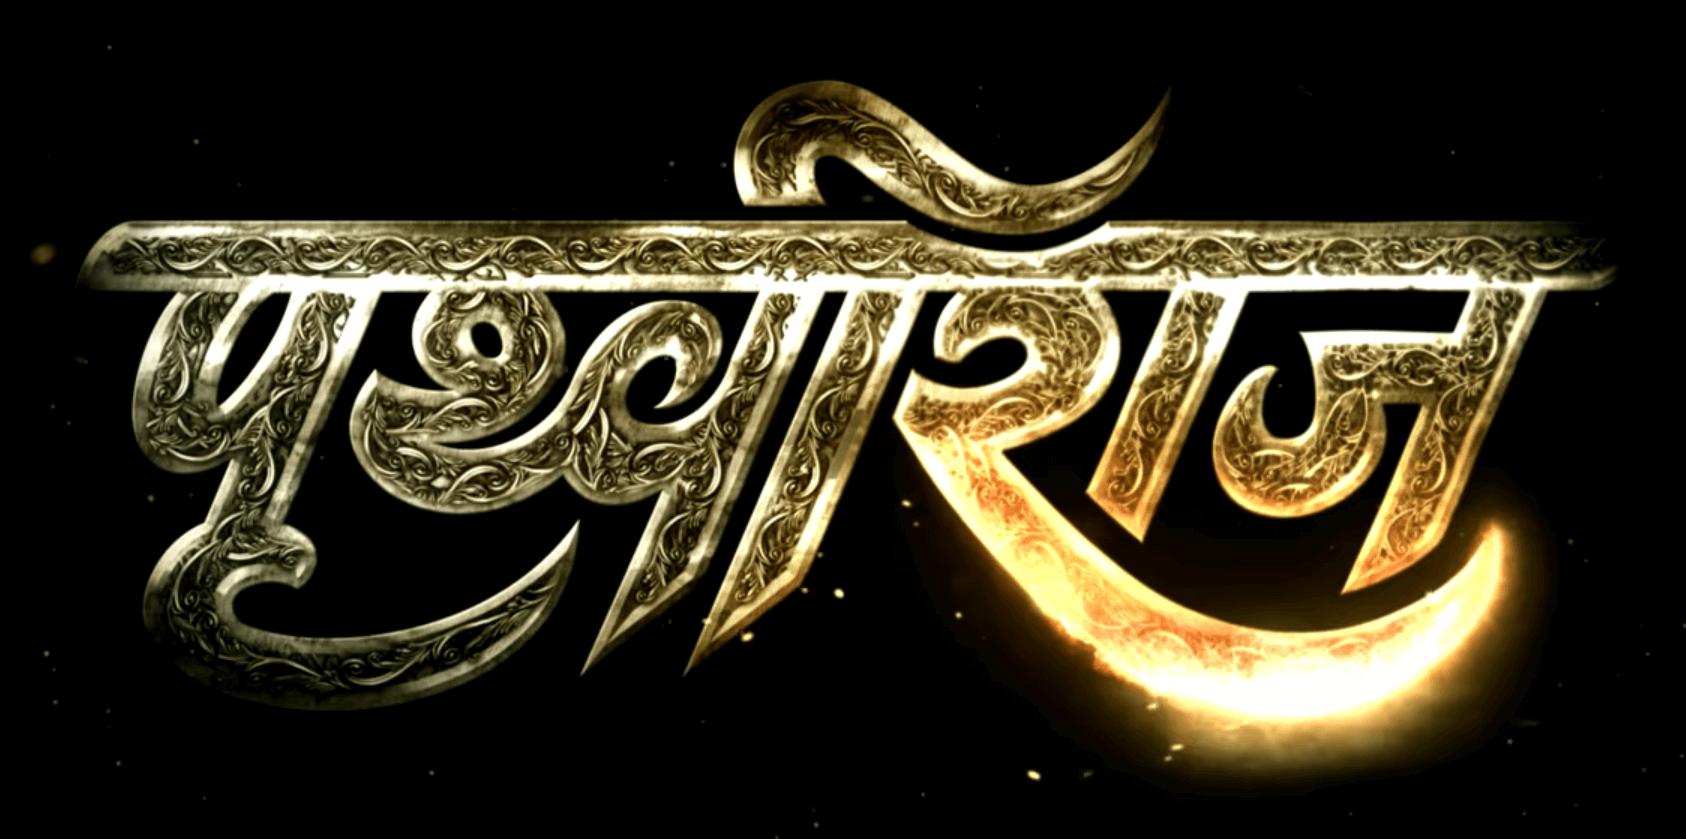 Prithviraj Hindi Movie